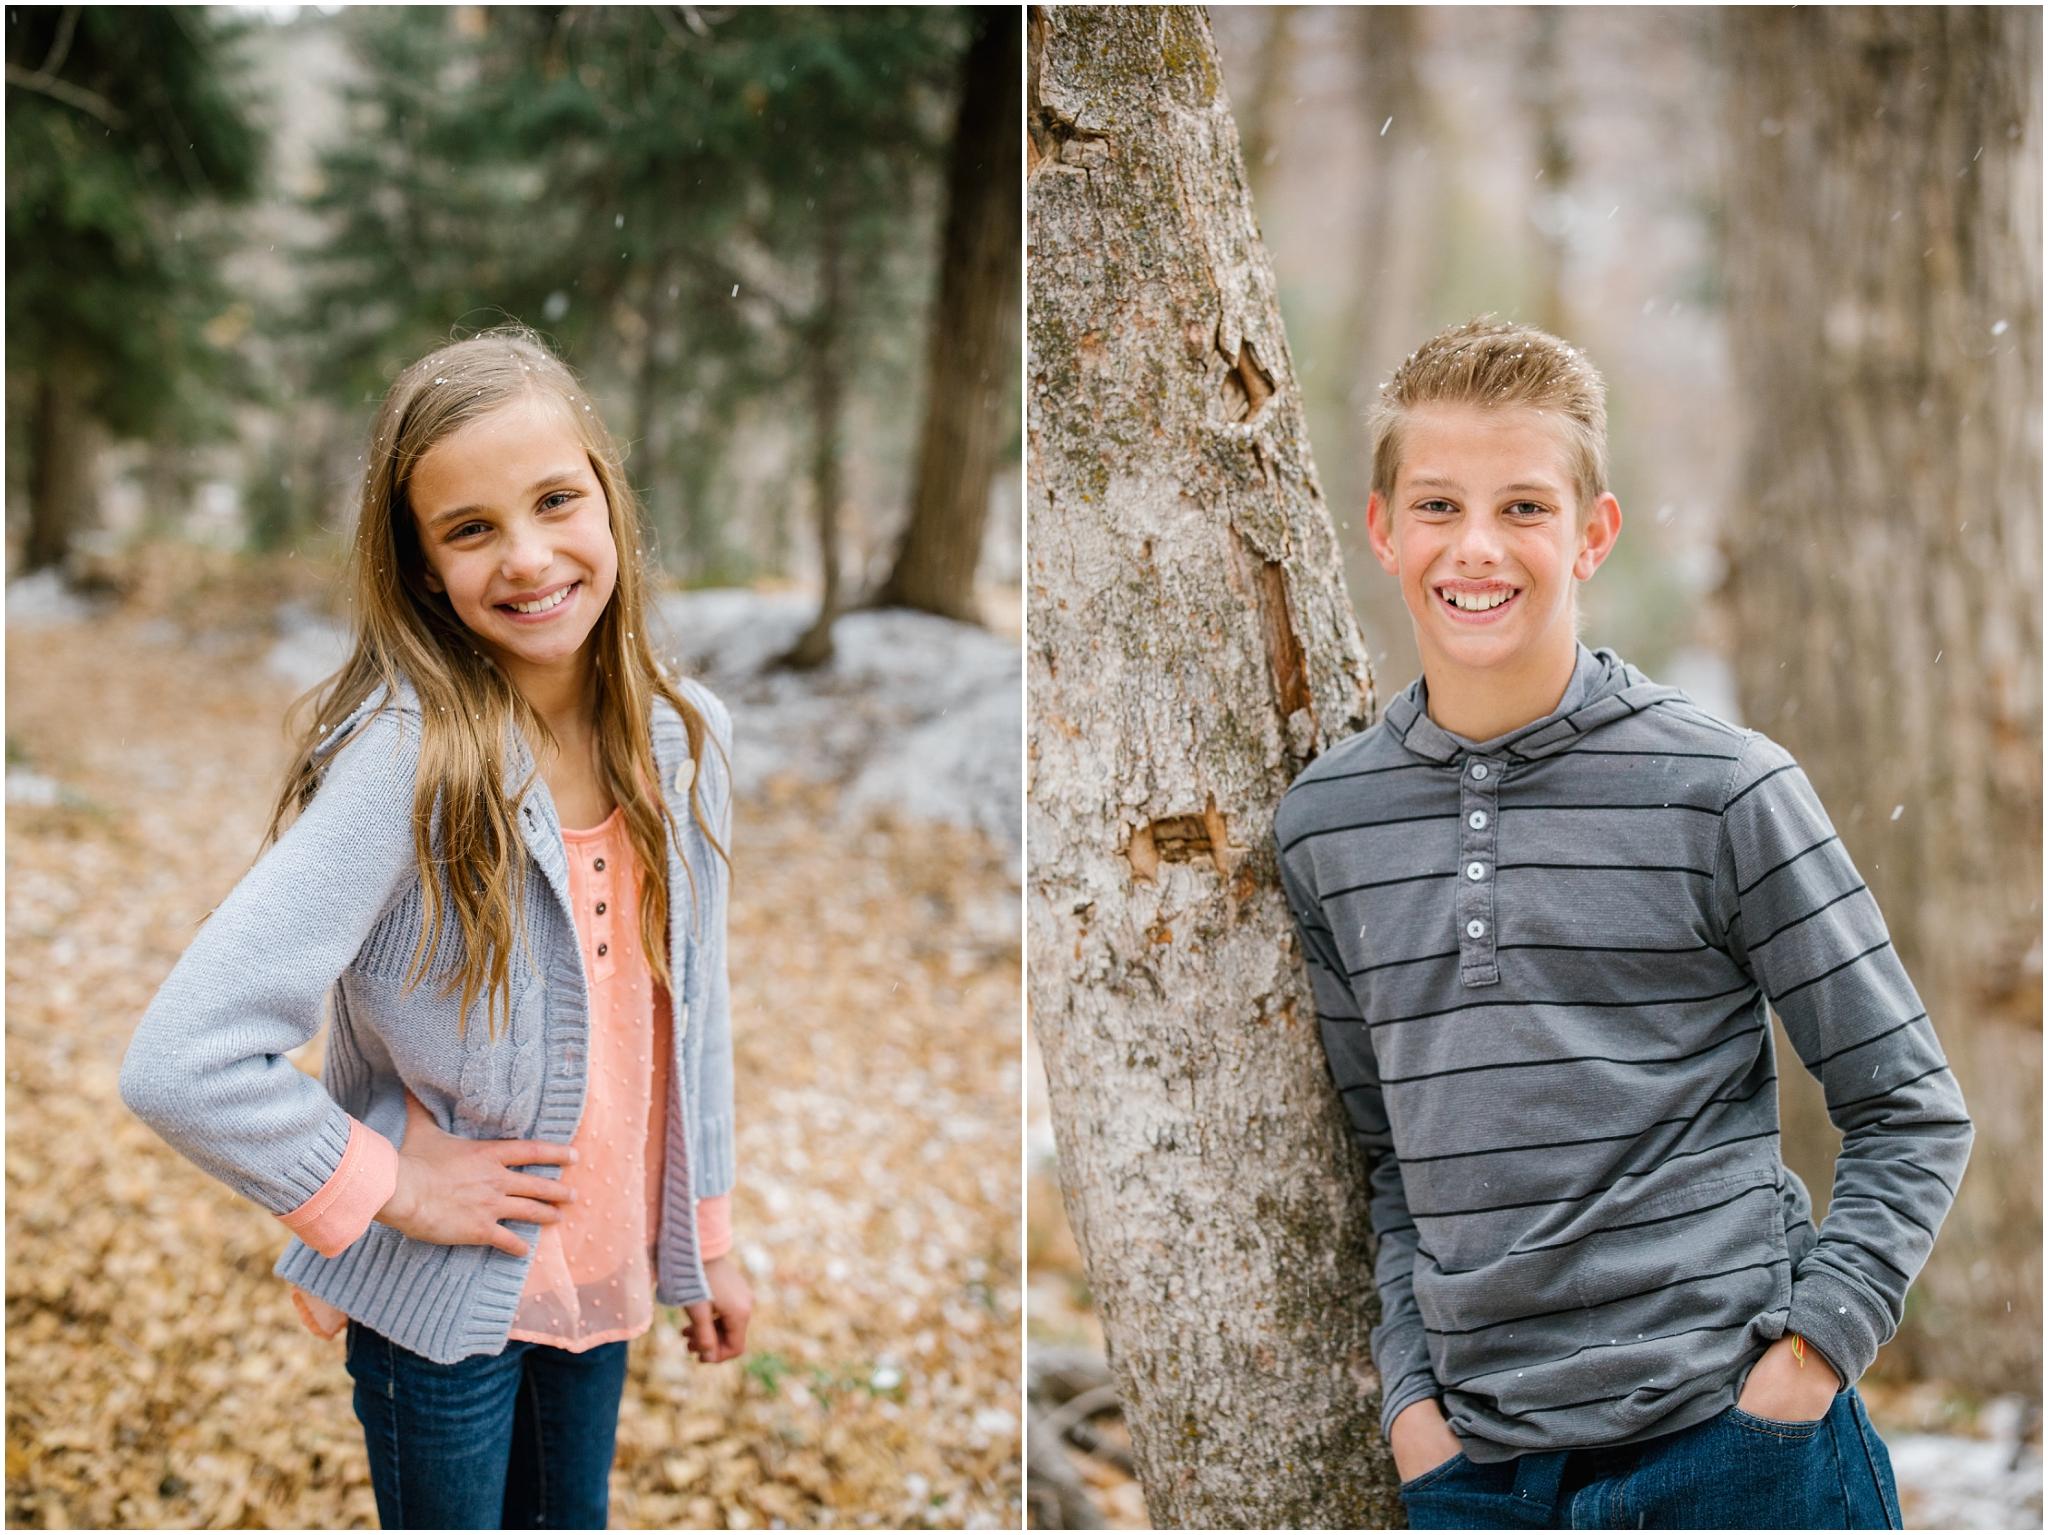 Vance-86_Lizzie-B-Imagery-Utah-Family-Photographer-Salt-Lake-City-Park-City-Utah-County-Payson-Canyon.jpg